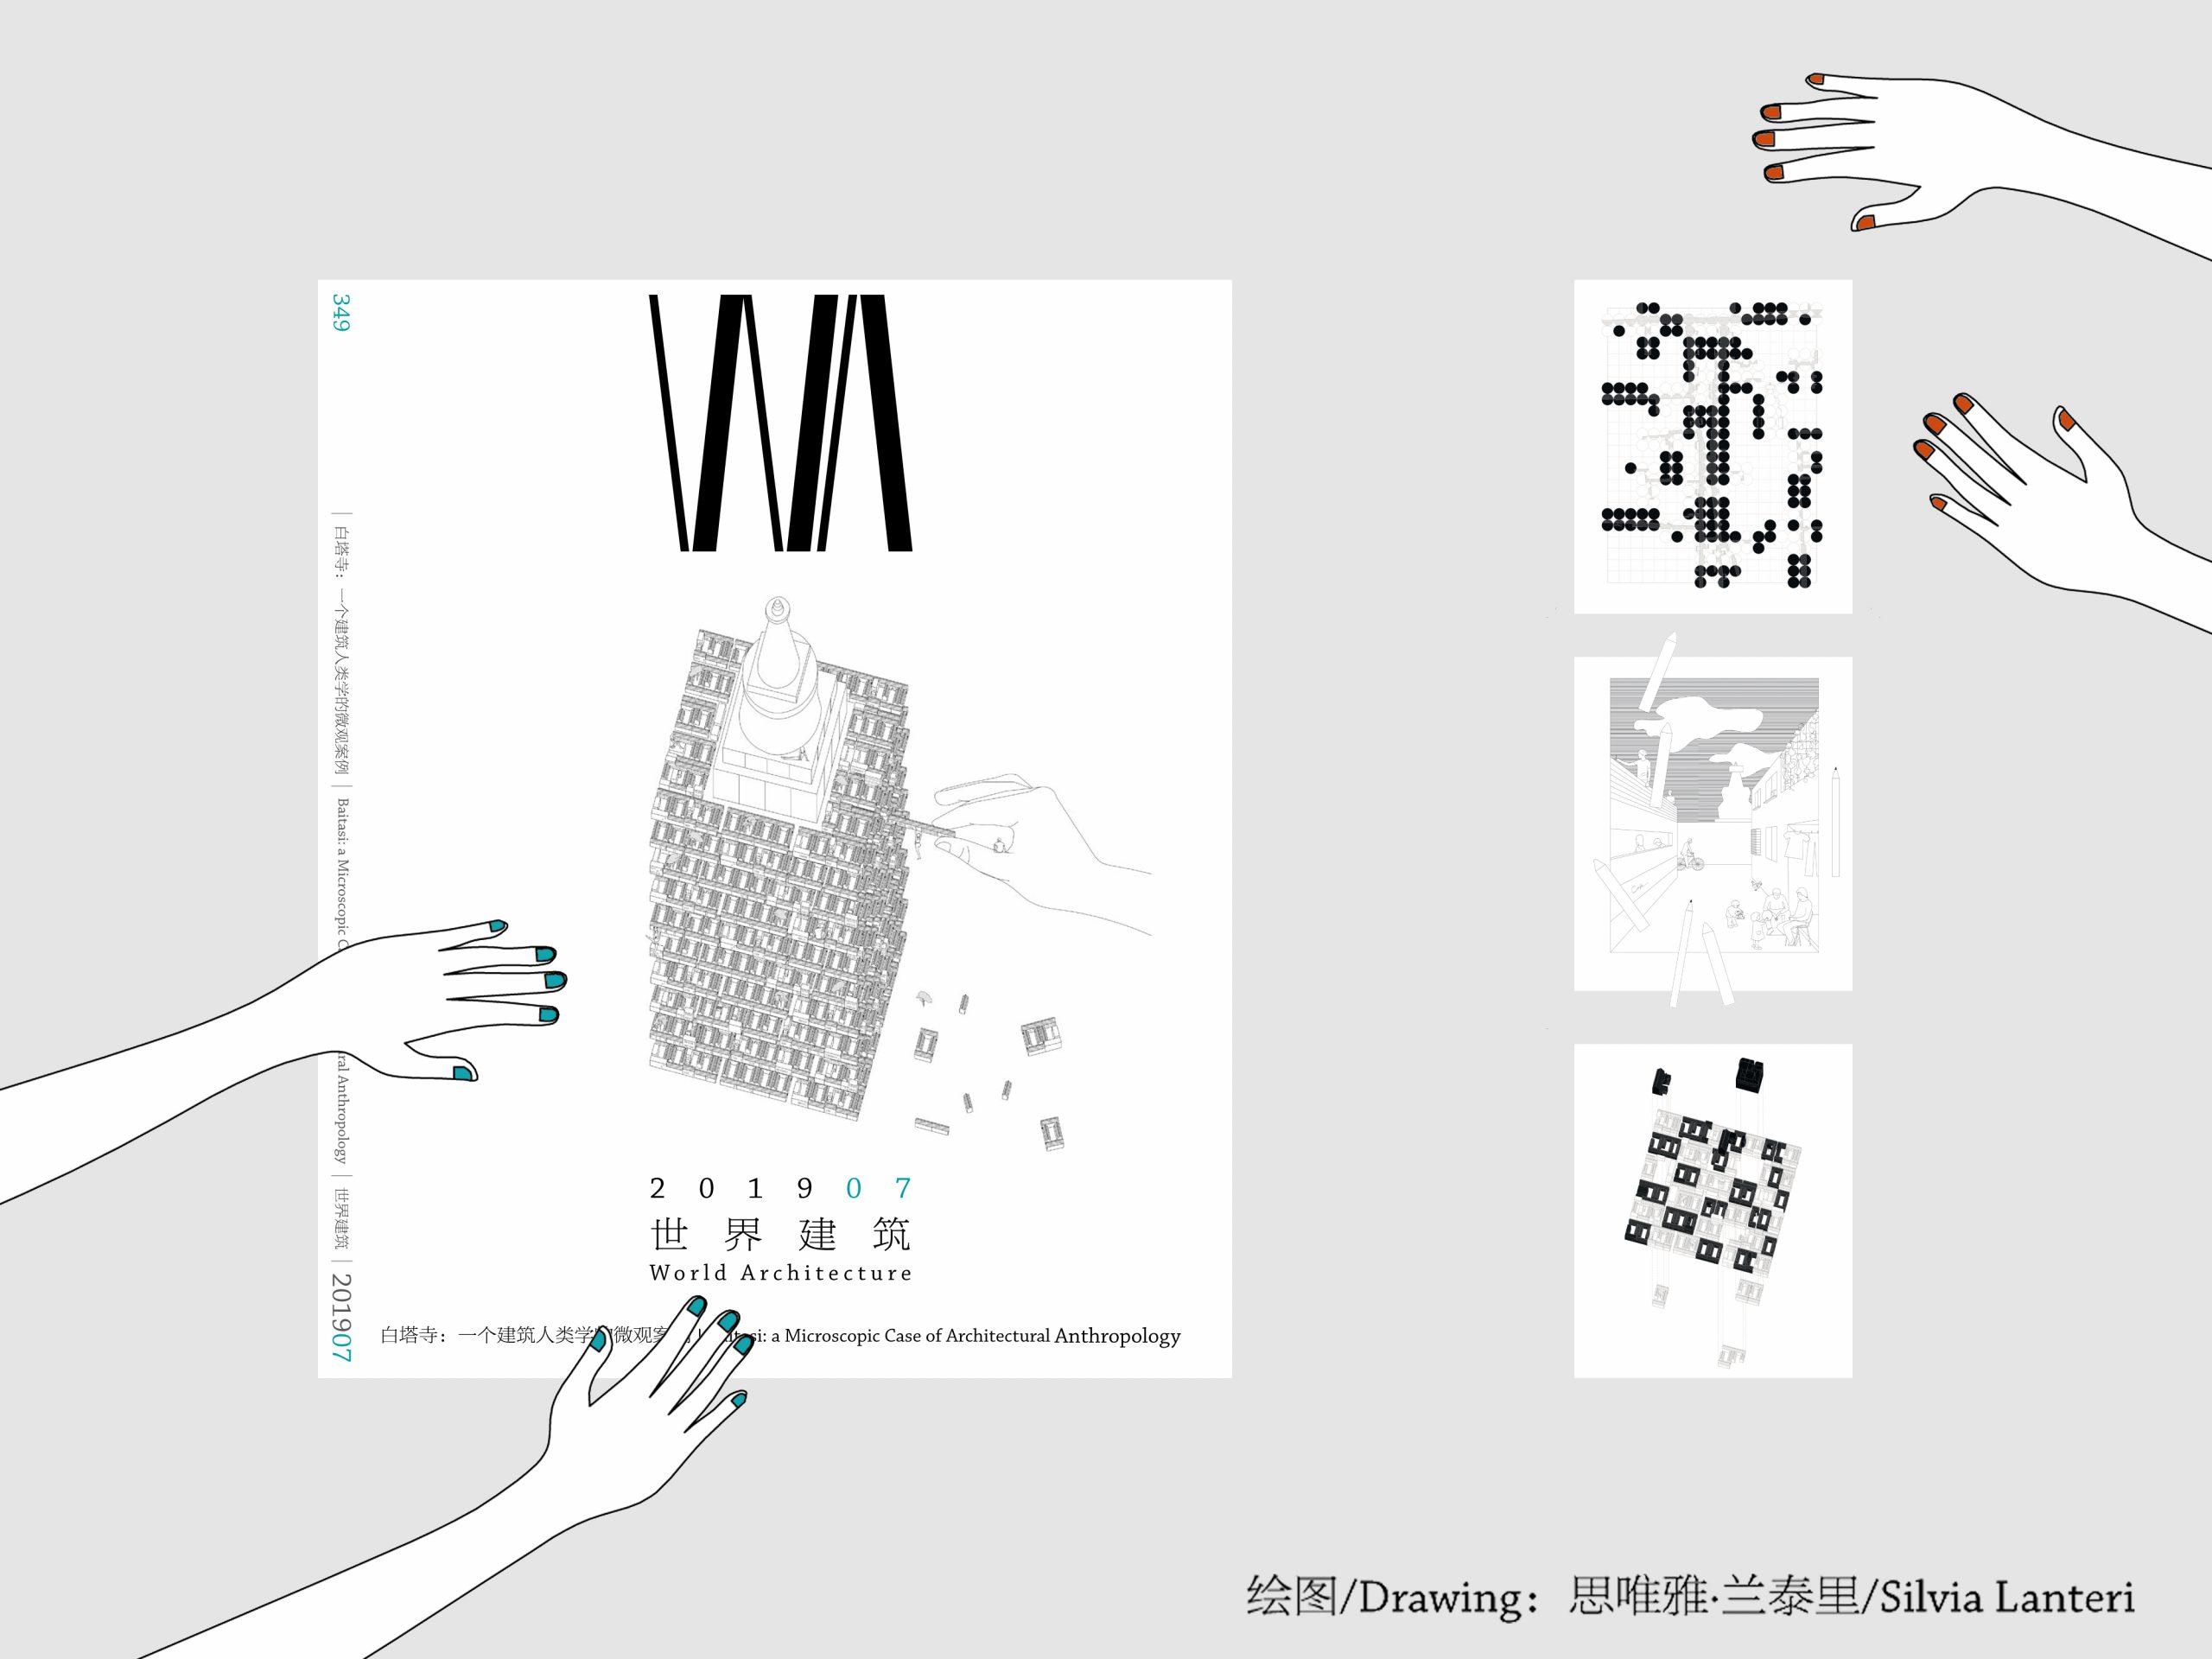 wa_silvia lanteri_drawings